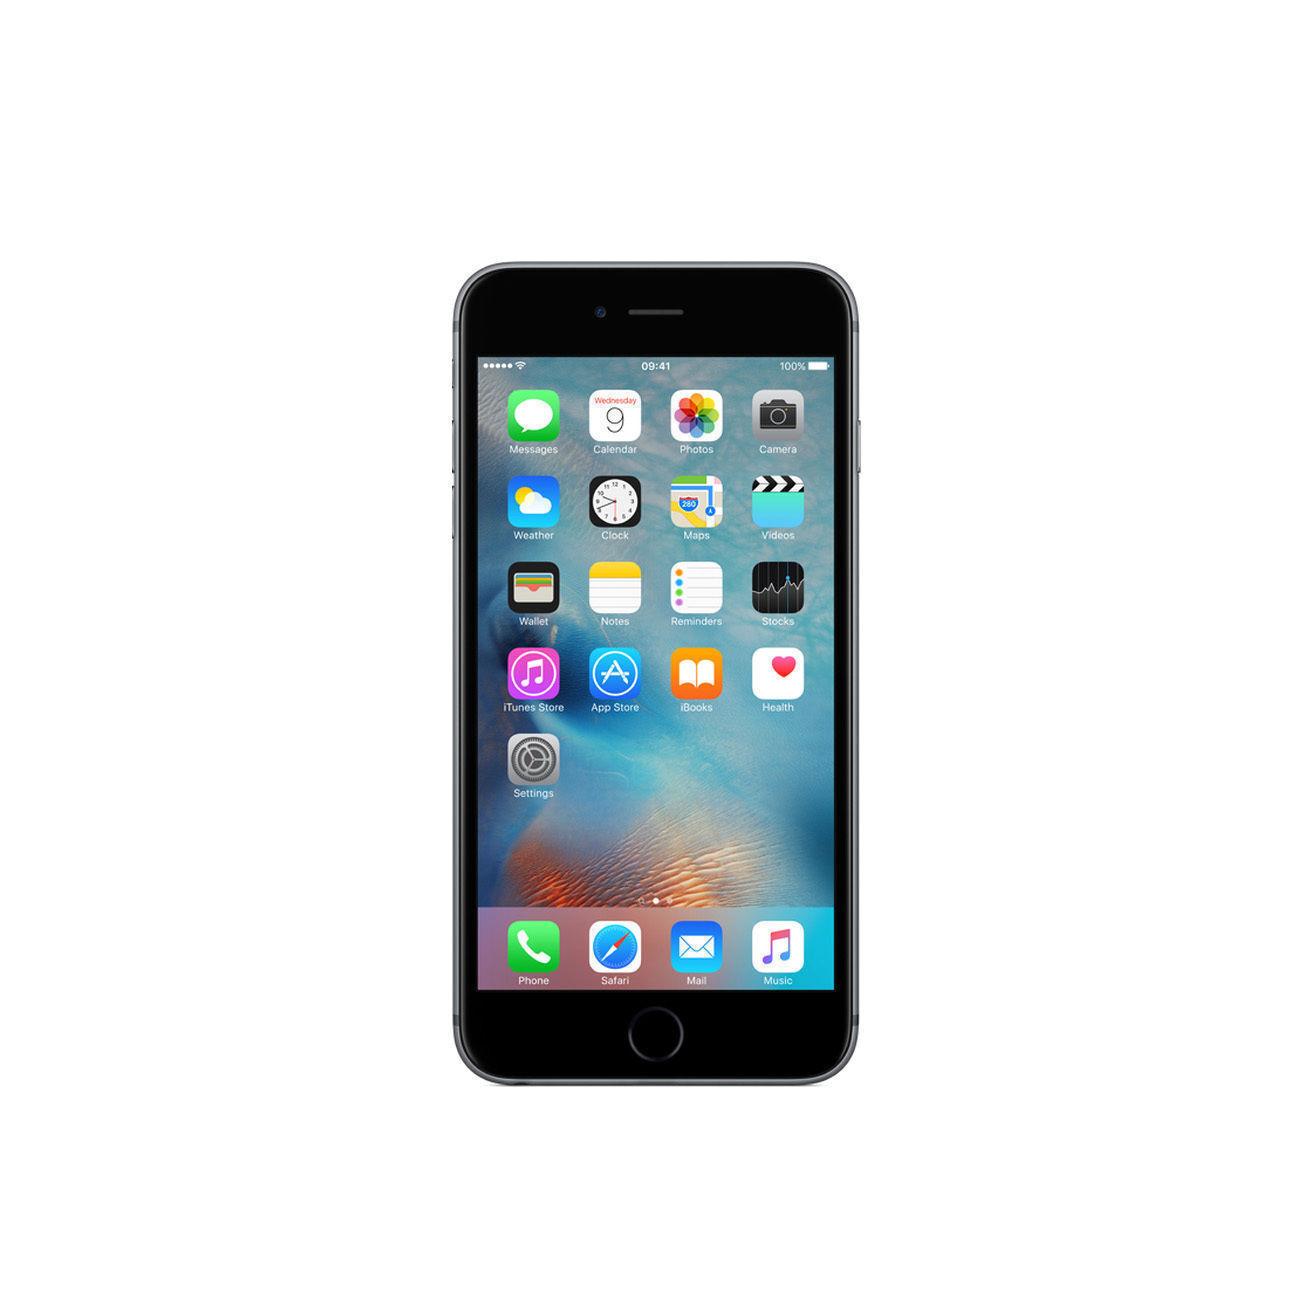 Apple iPhone 6s Plus - 64GB - Space Gray (Unlocked) A1687 (CDMA + GSM)